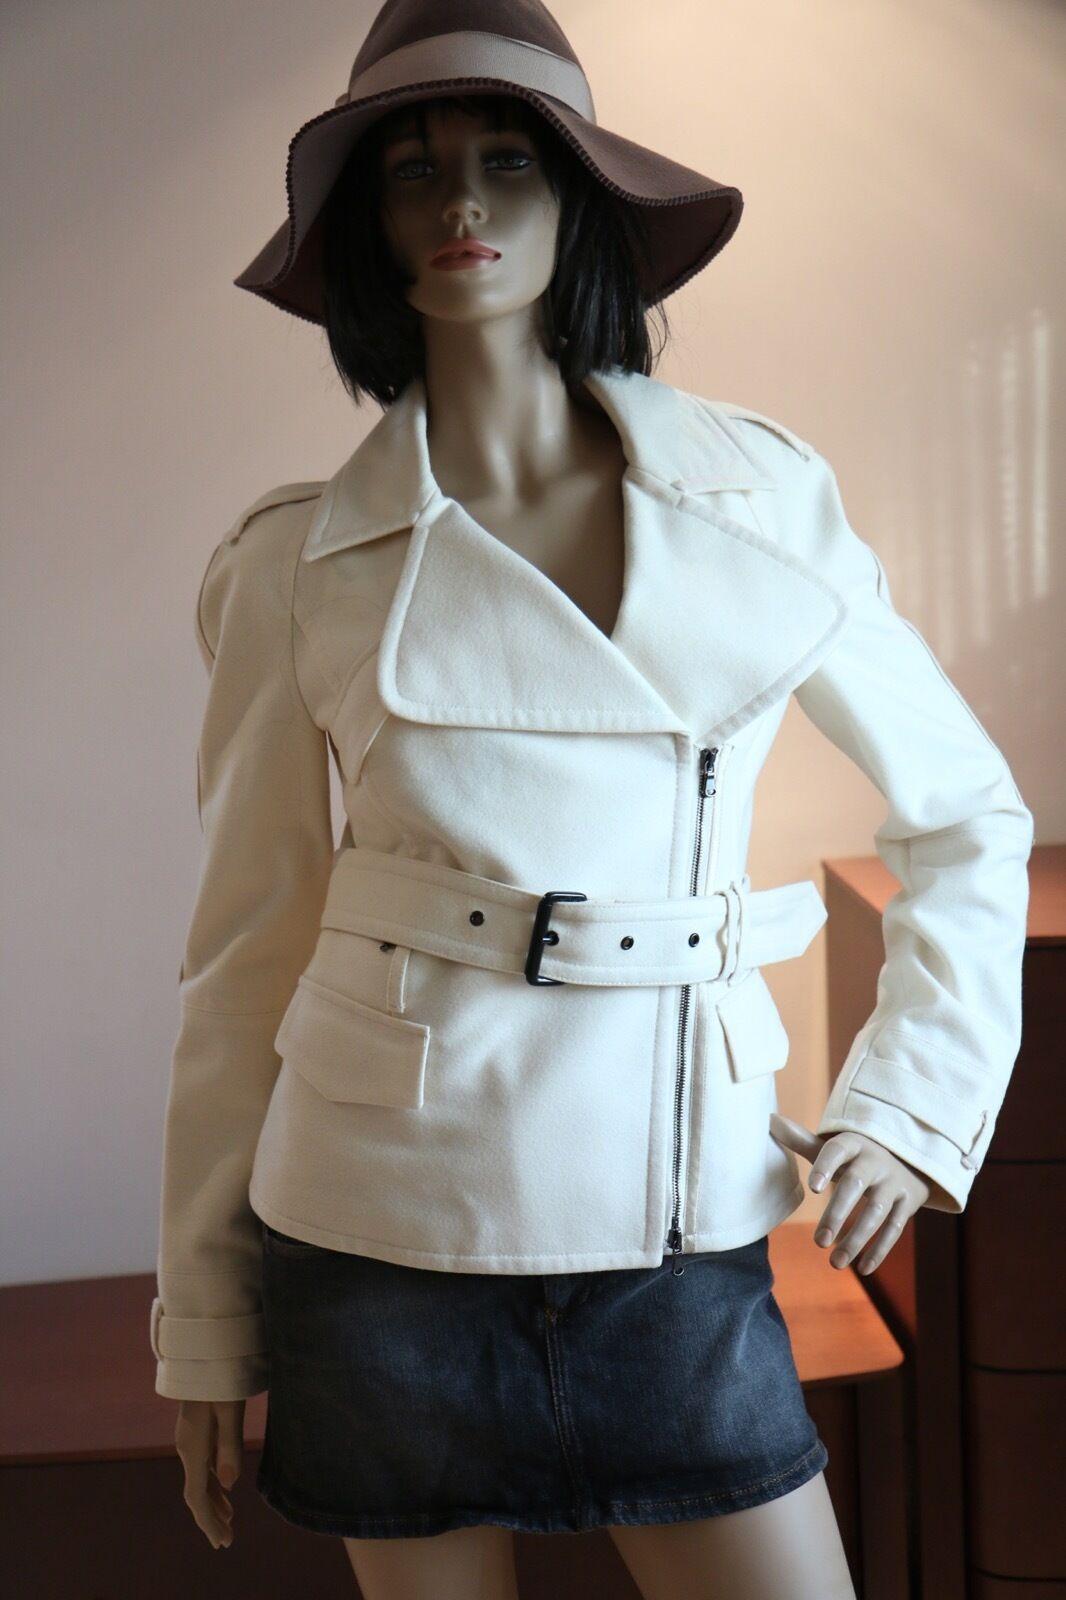 Costume National blancoo Apagado  Chaqueta abrigo collar de Stand Up 44  se descuenta